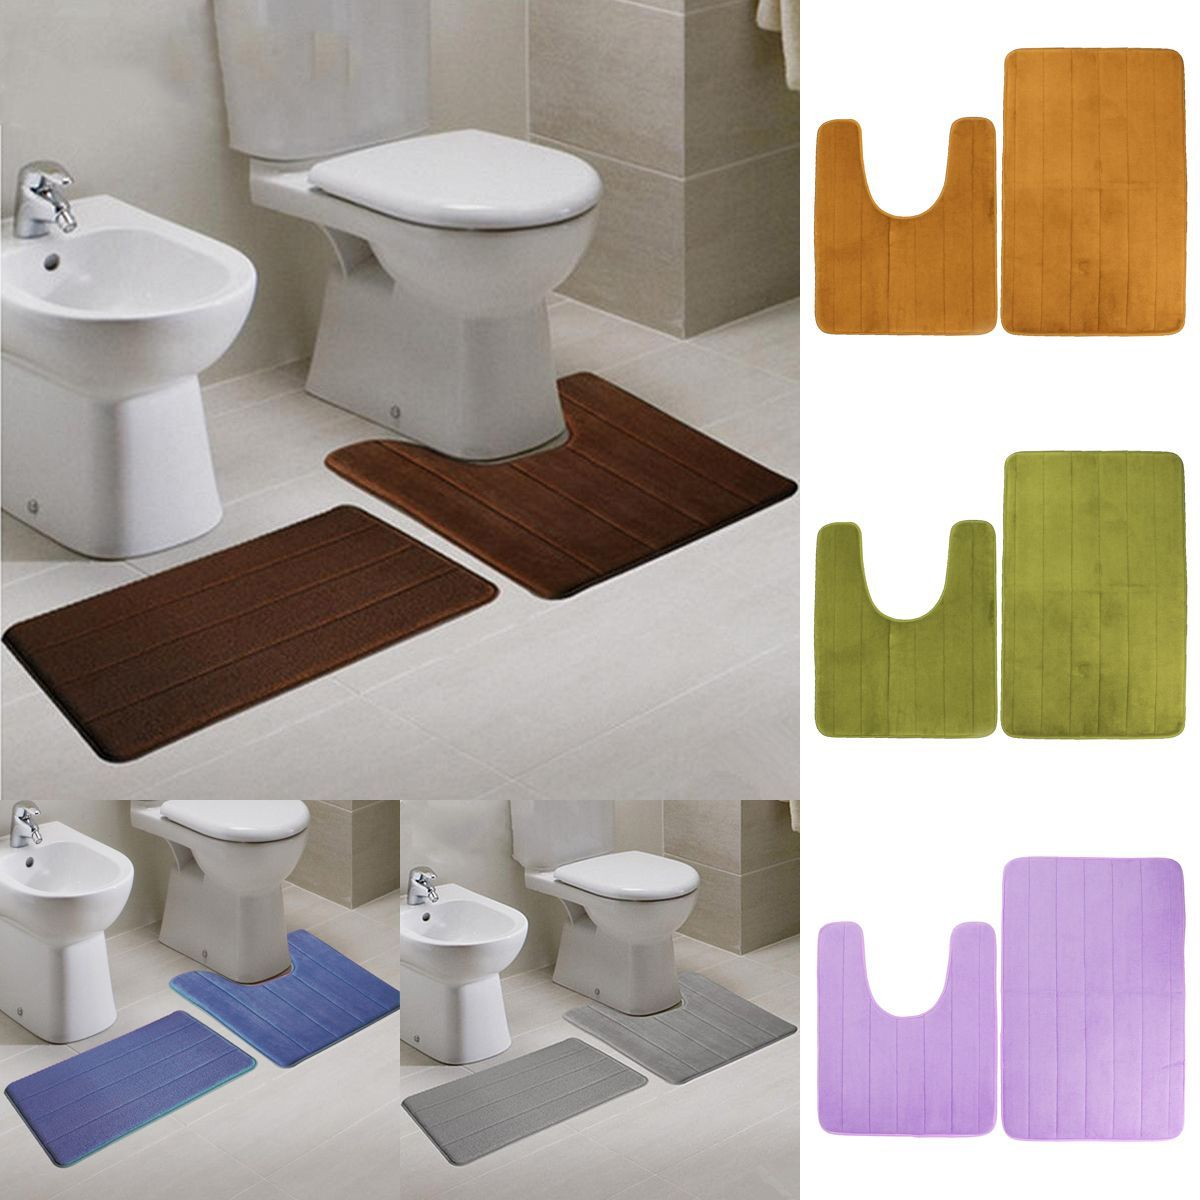 2pcs Super Absorbent Memory Foam Coral Velvet Toilet Mat Set Bathroom Rug Floor Feet Cushion Bathroomrugs Bathroom Rugs Floor Rugs Toilet Mat